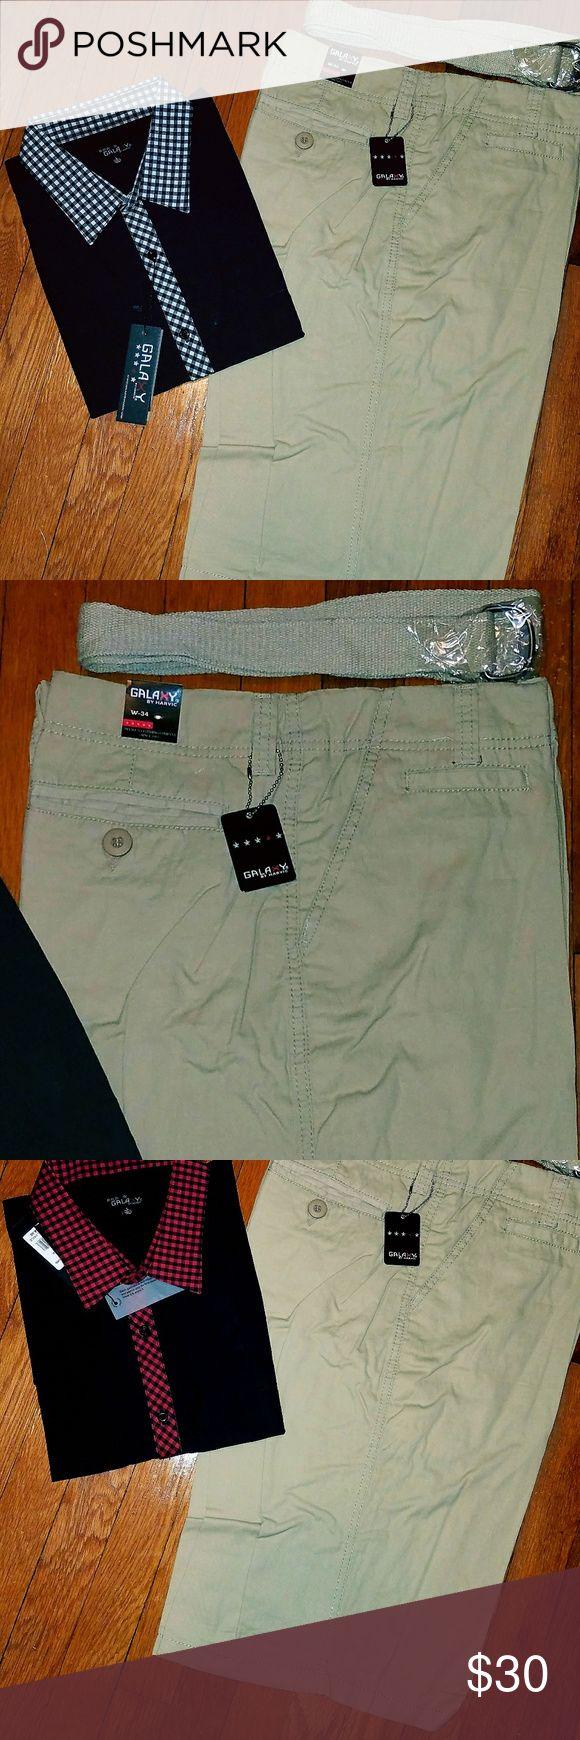 Men's Khaki Shorts Brand new. Size 34 waist. Congress with fabric belt. Galaxy Shorts Flat Front